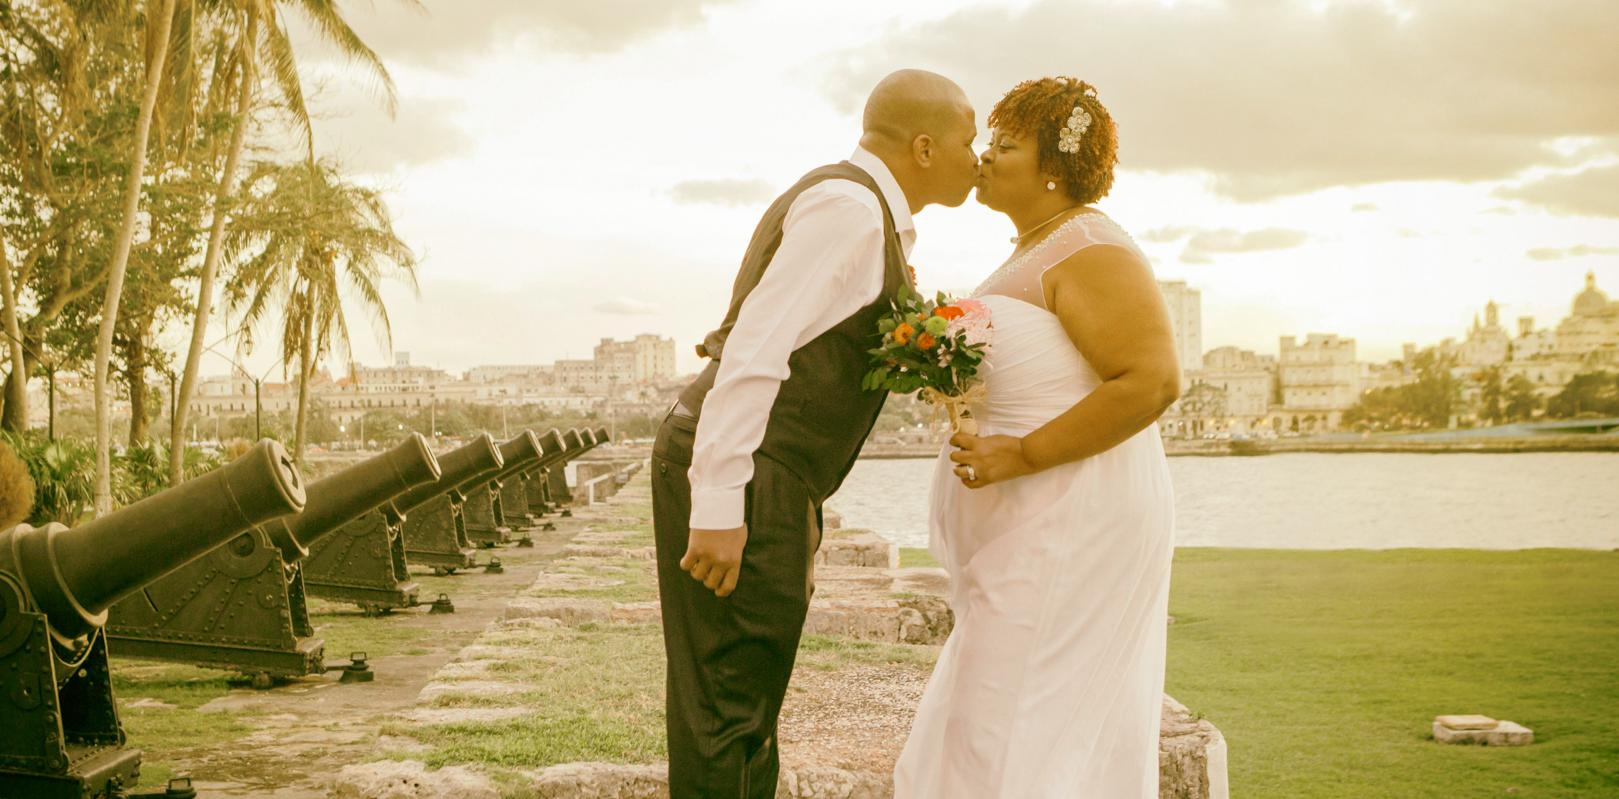 bodas-sin-clasificar-sin-tema-cuba-42141.jpg